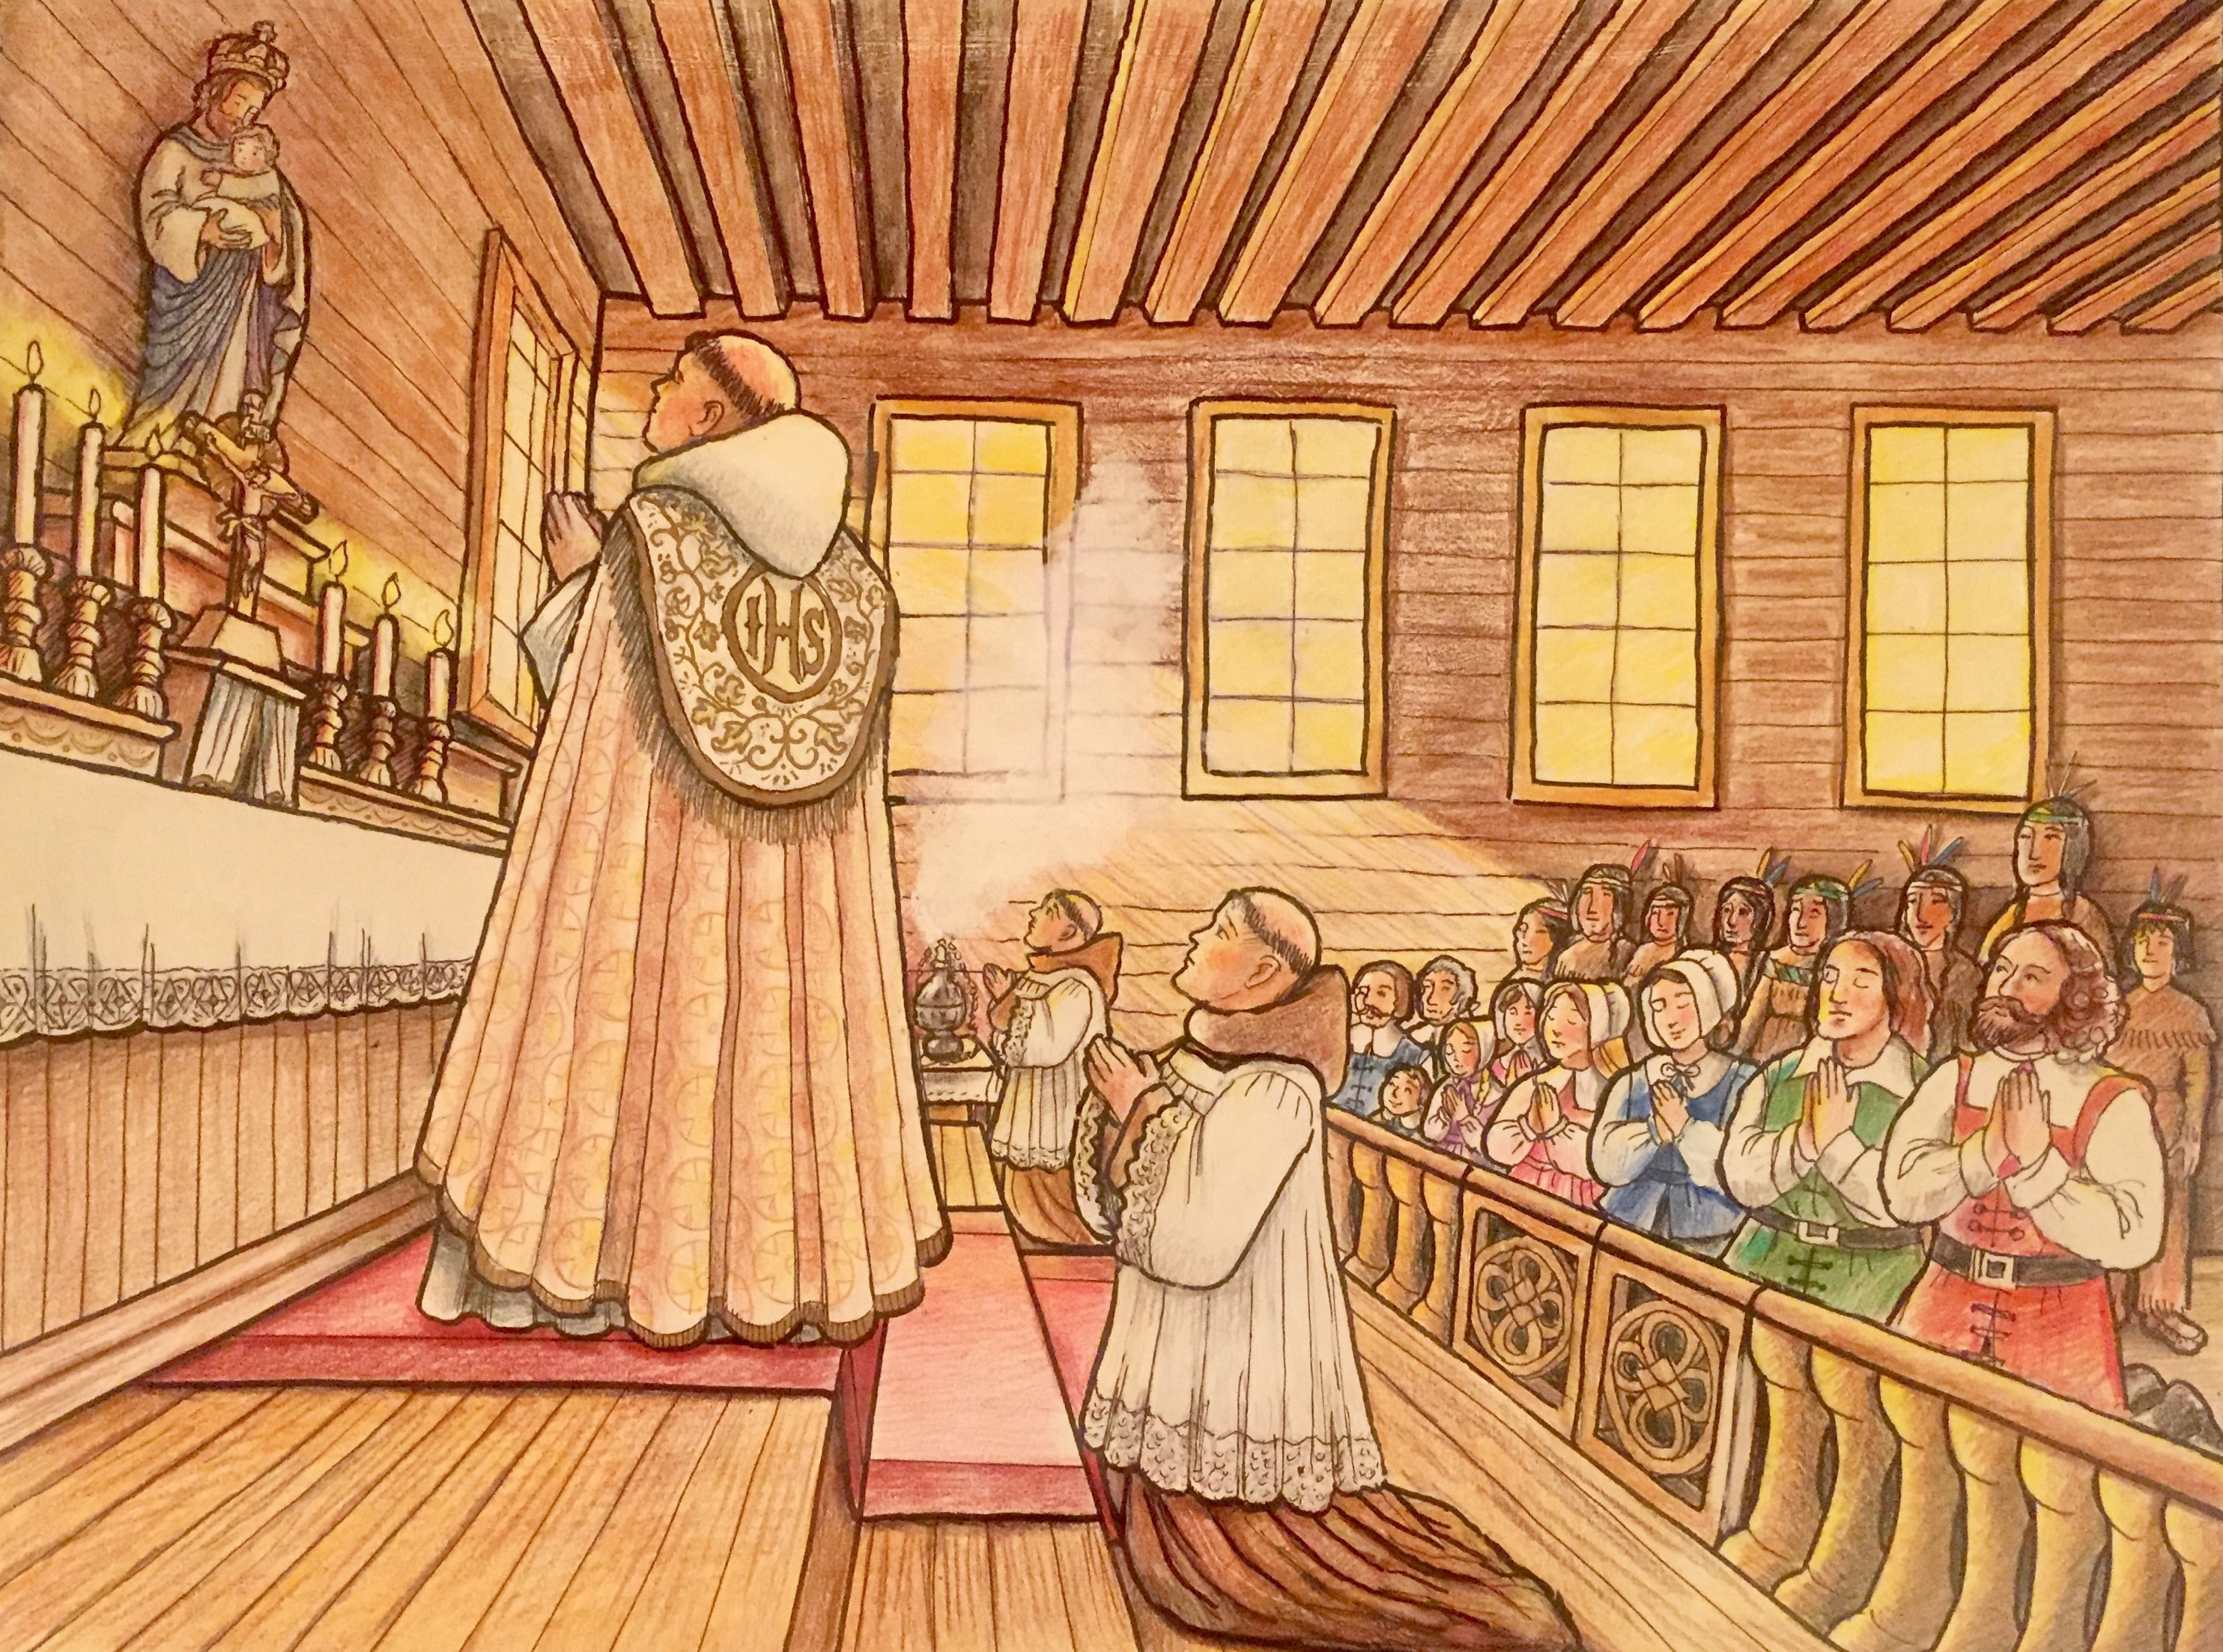 Consecration of Canada to Saint Joseph Image